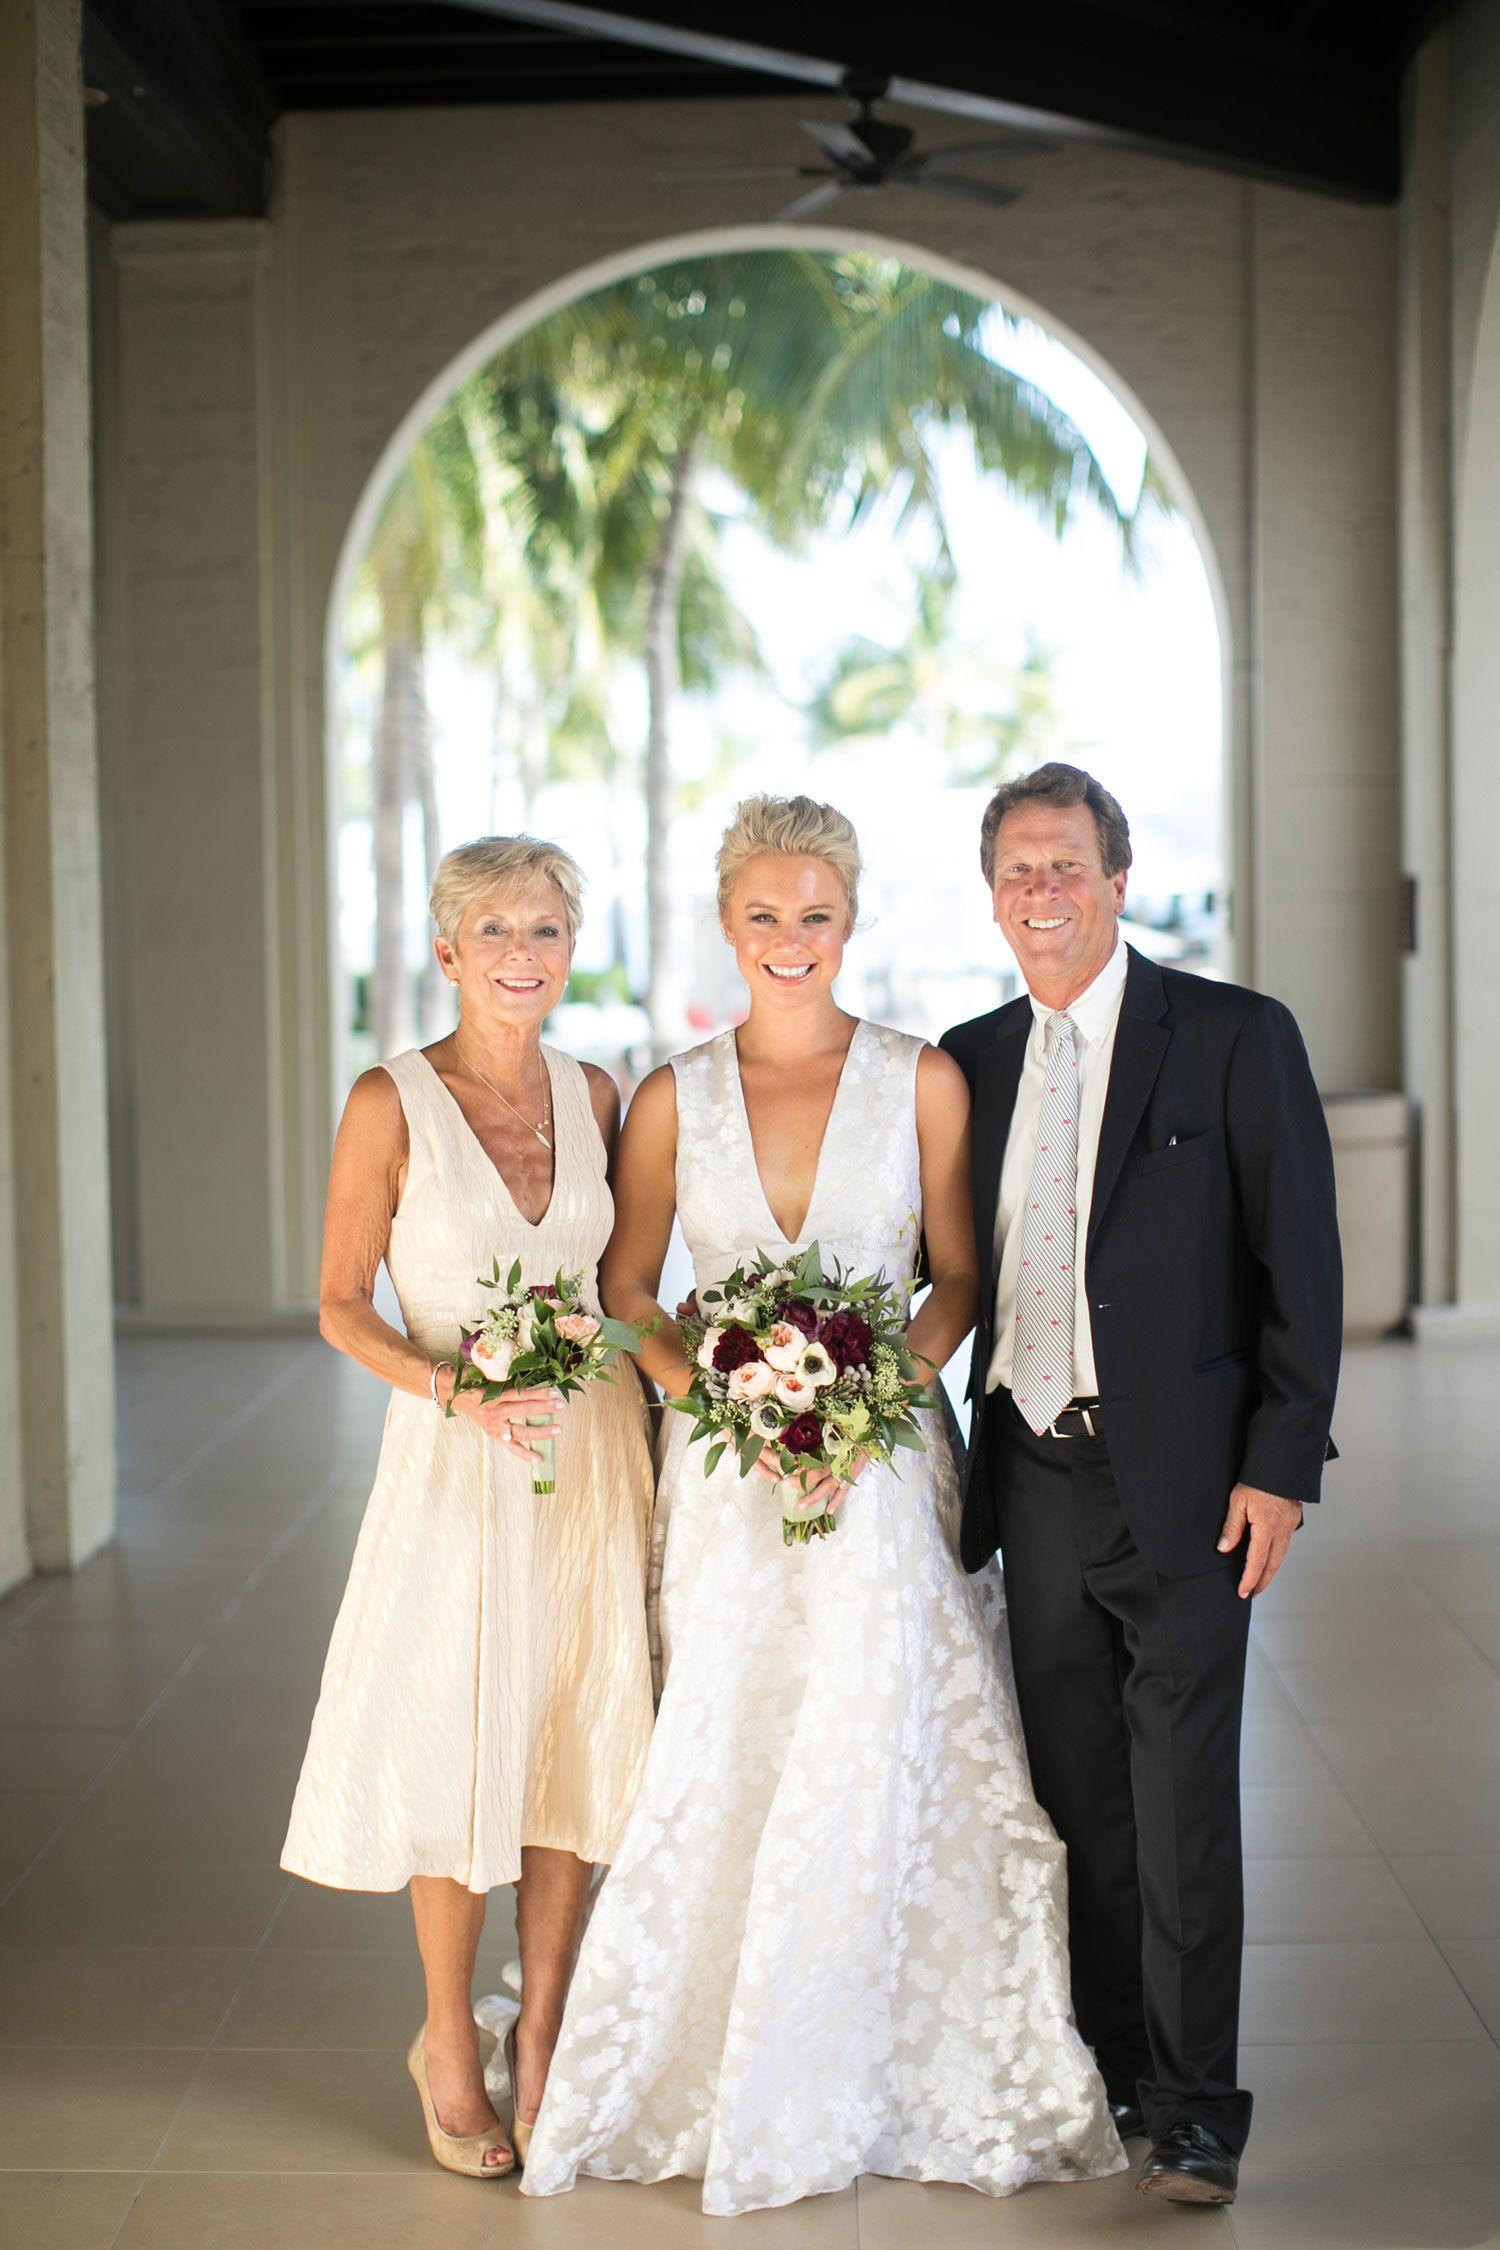 Fall Destination Wedding On The Beach In Key West Florida Inside Weddings Beach Wedding Attire Wedding Inside Beach Wedding Guest Dress,Wedding Mother Daughter Combo Dress India